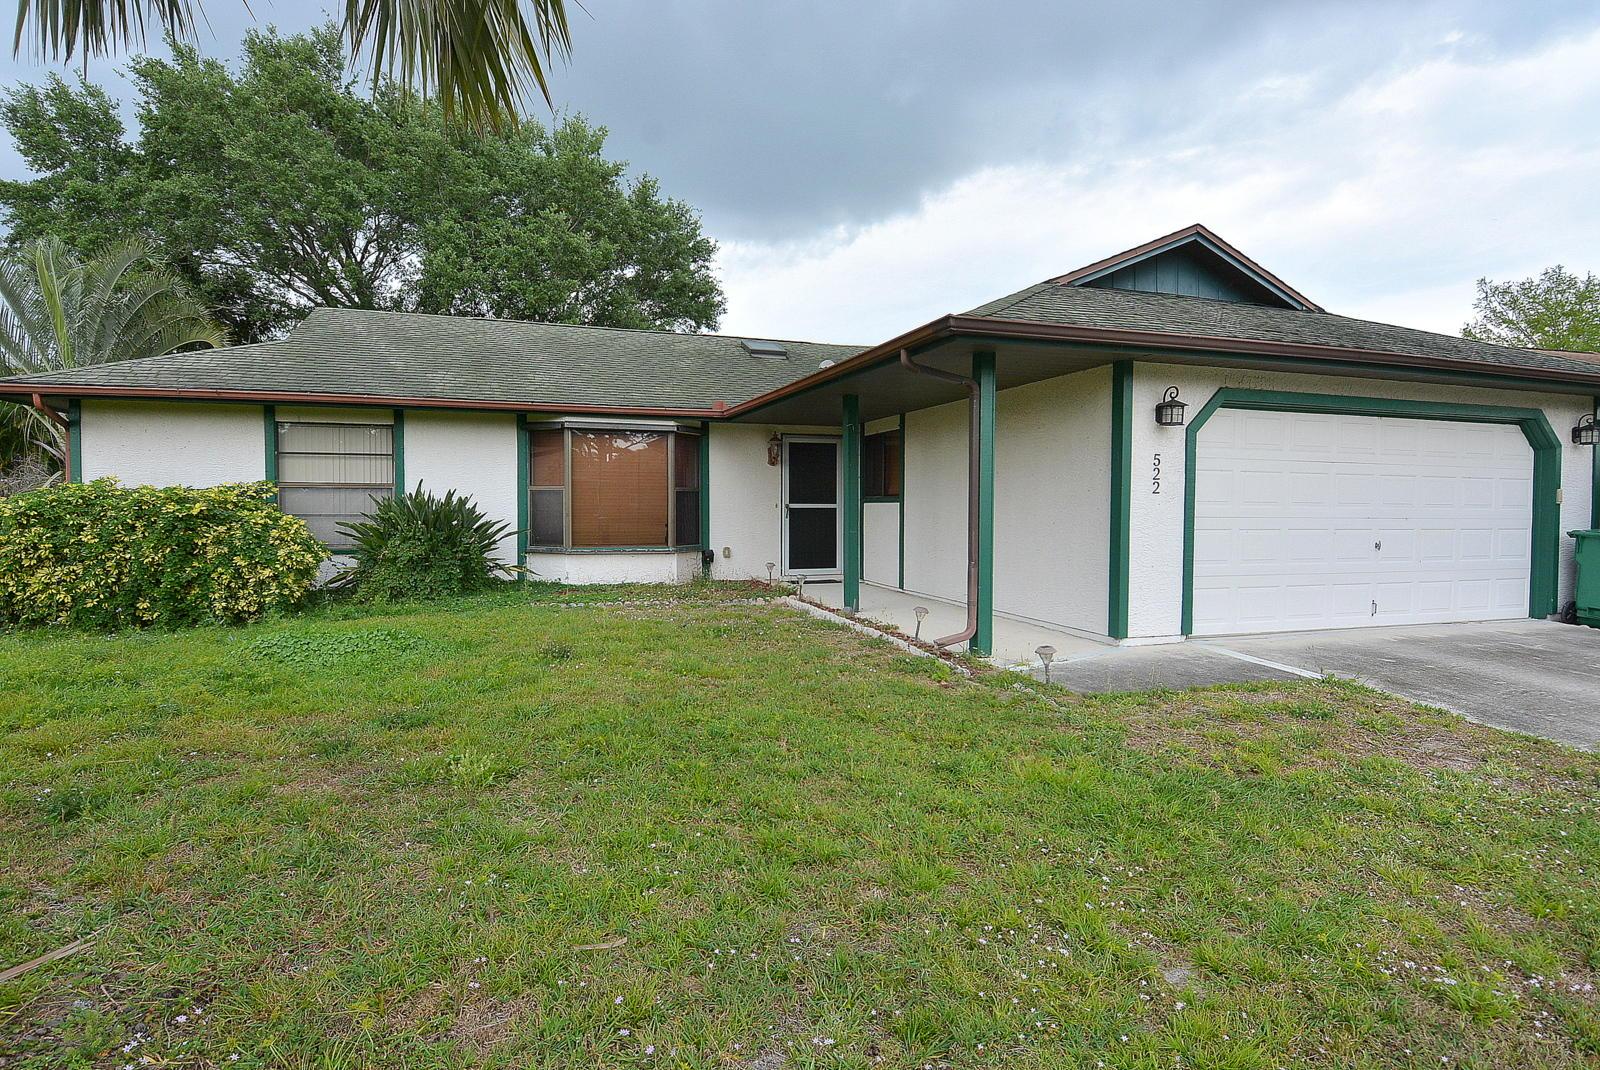 522 NW Turton Terrace - Port St Lucie, Florida